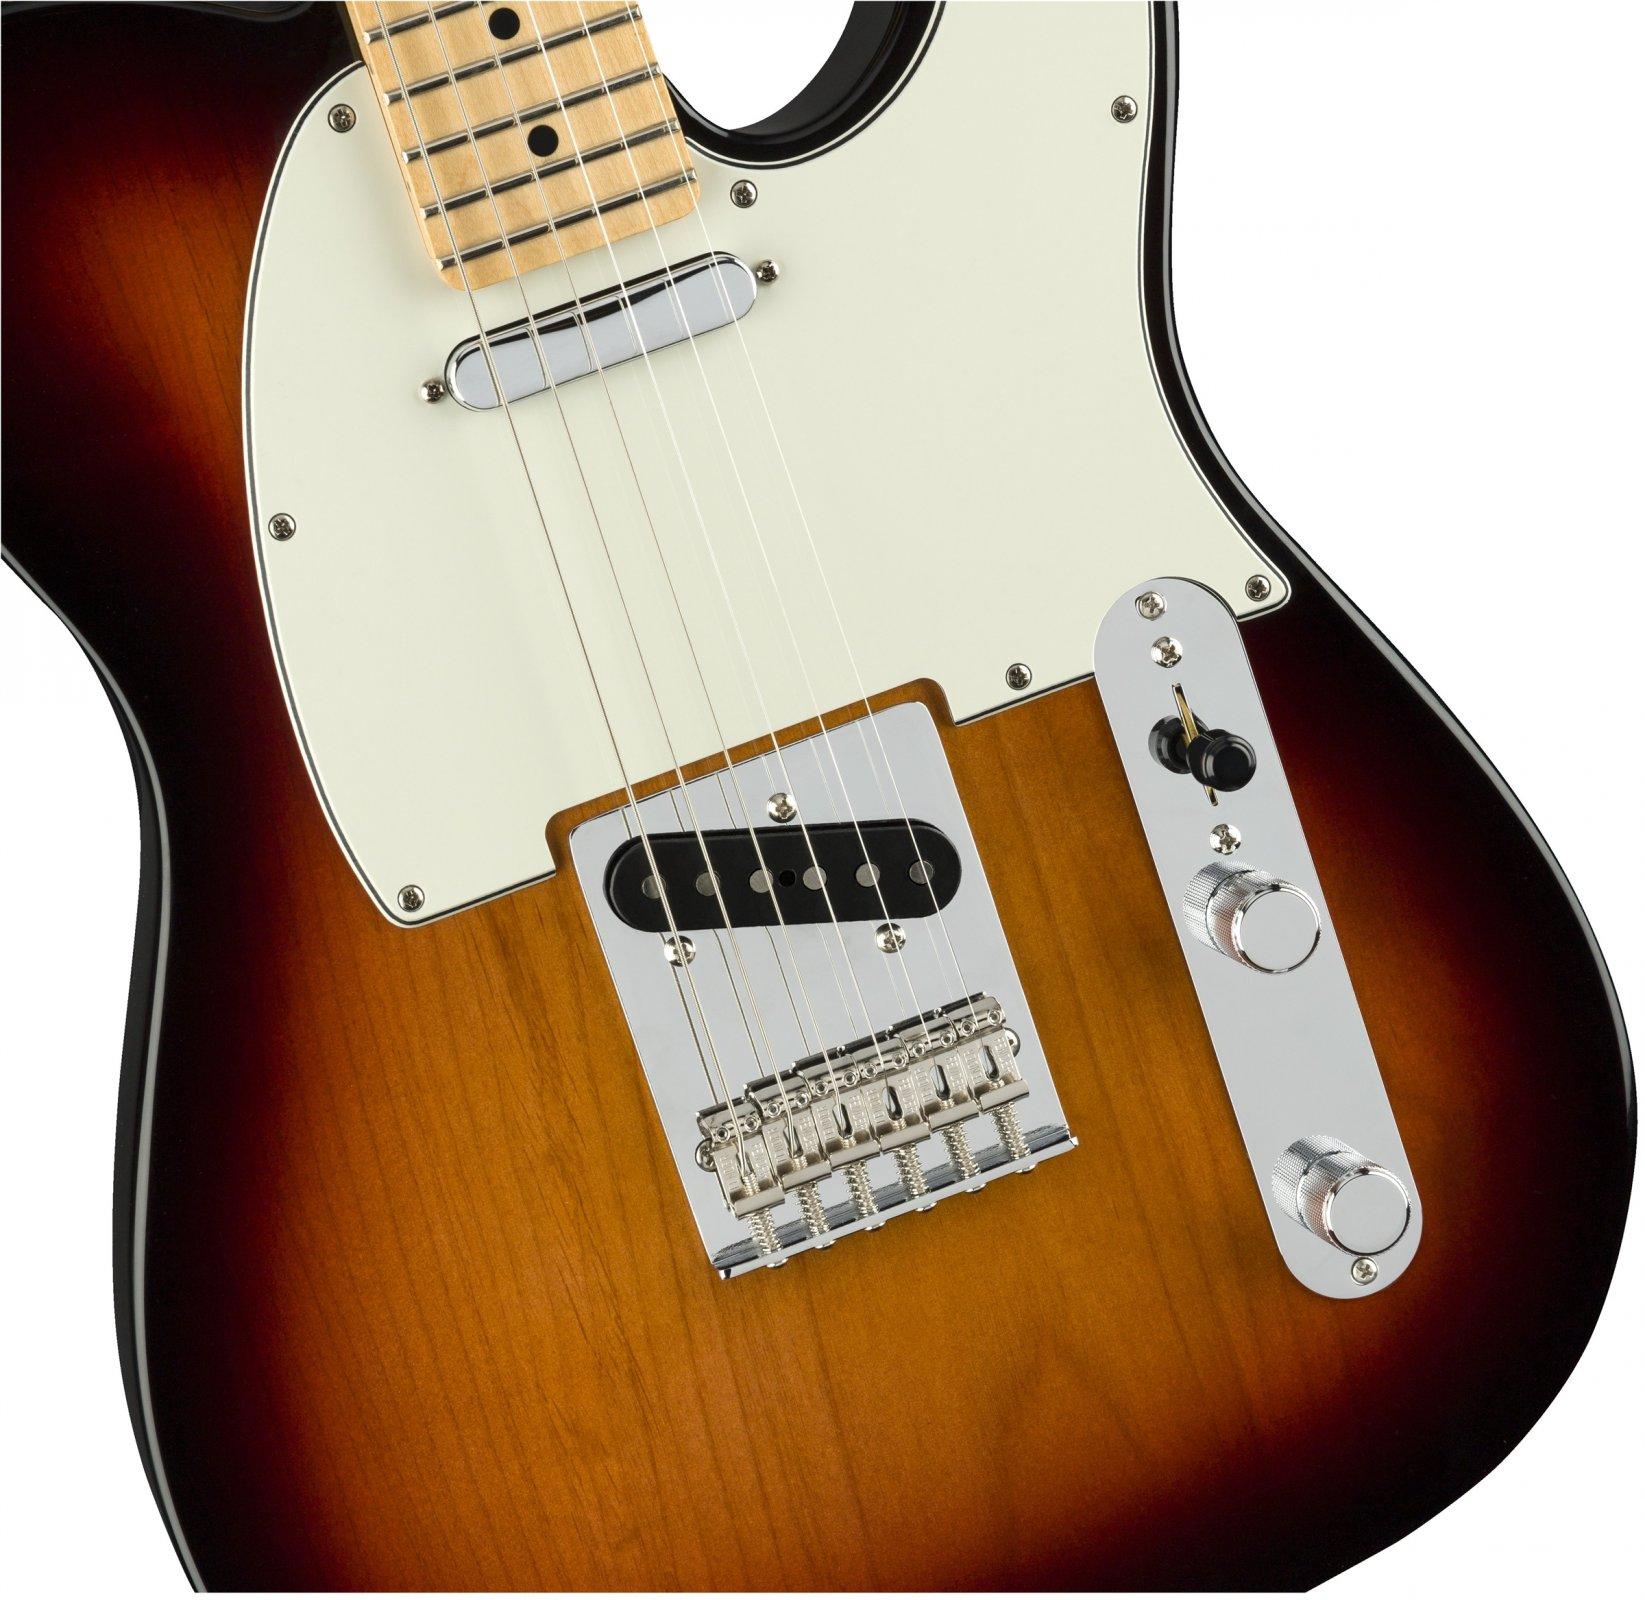 Fender Player Series Telecaster - 3 Color Sunburst w/ Maple Fingerboard